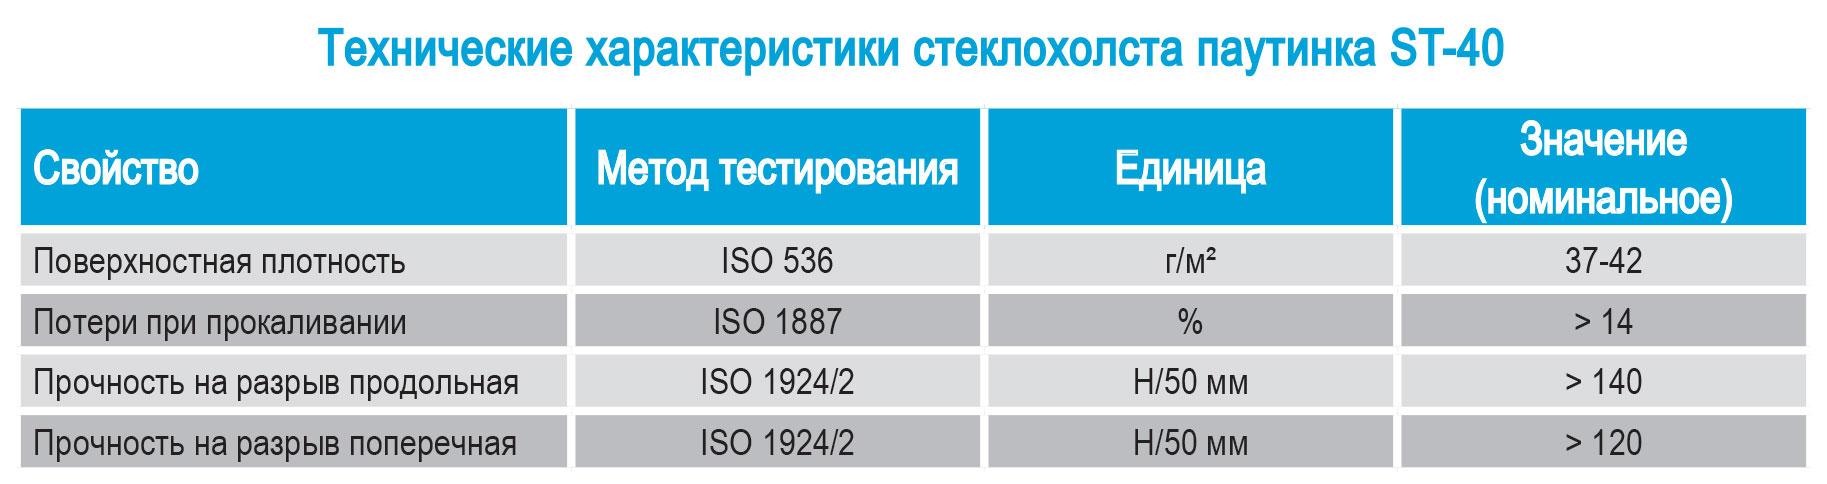 Spektrum ST-40, tekhnicheskije kharakteristiki